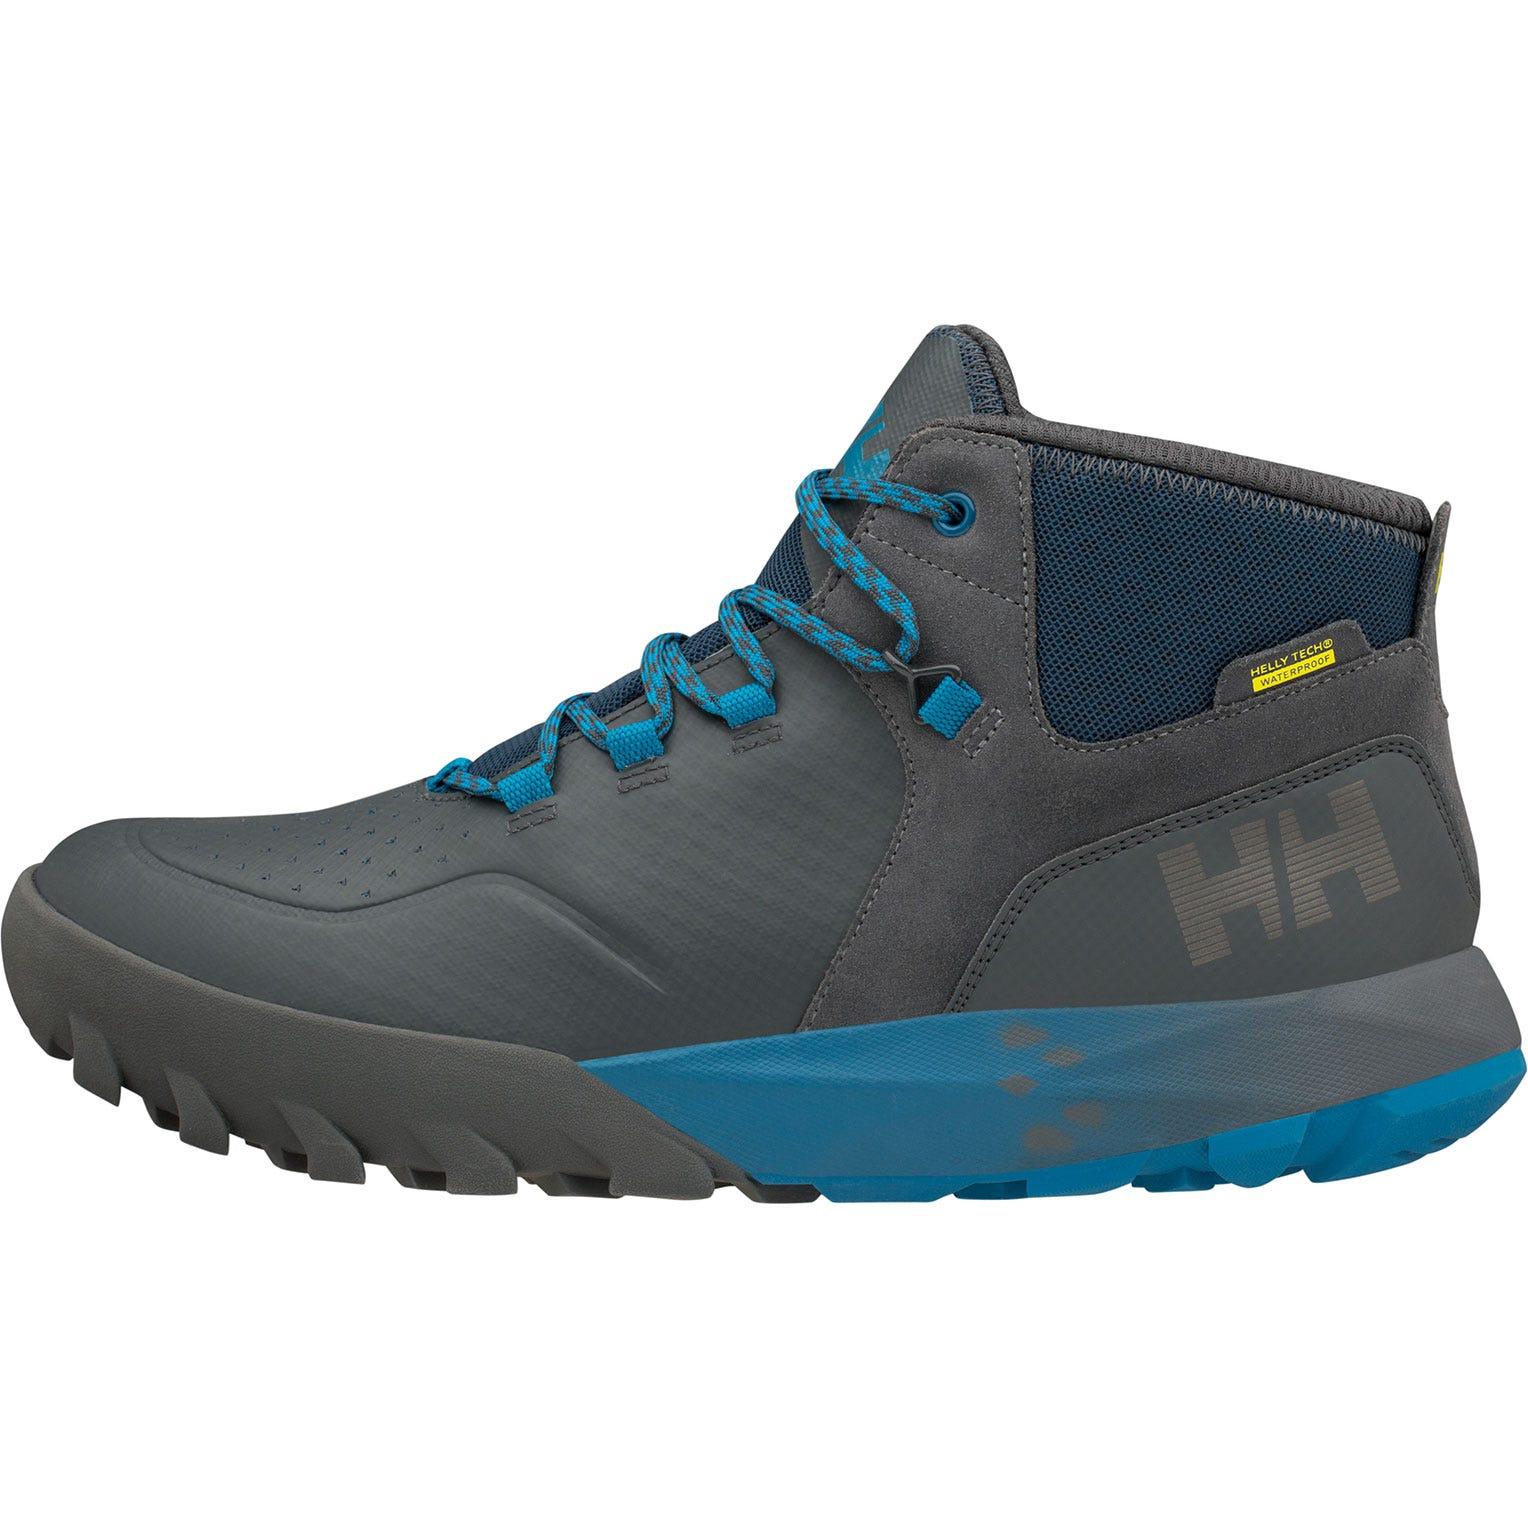 Helly Hansen Loke Rambler Ht Mens Hiking Boot Black 43/9.5